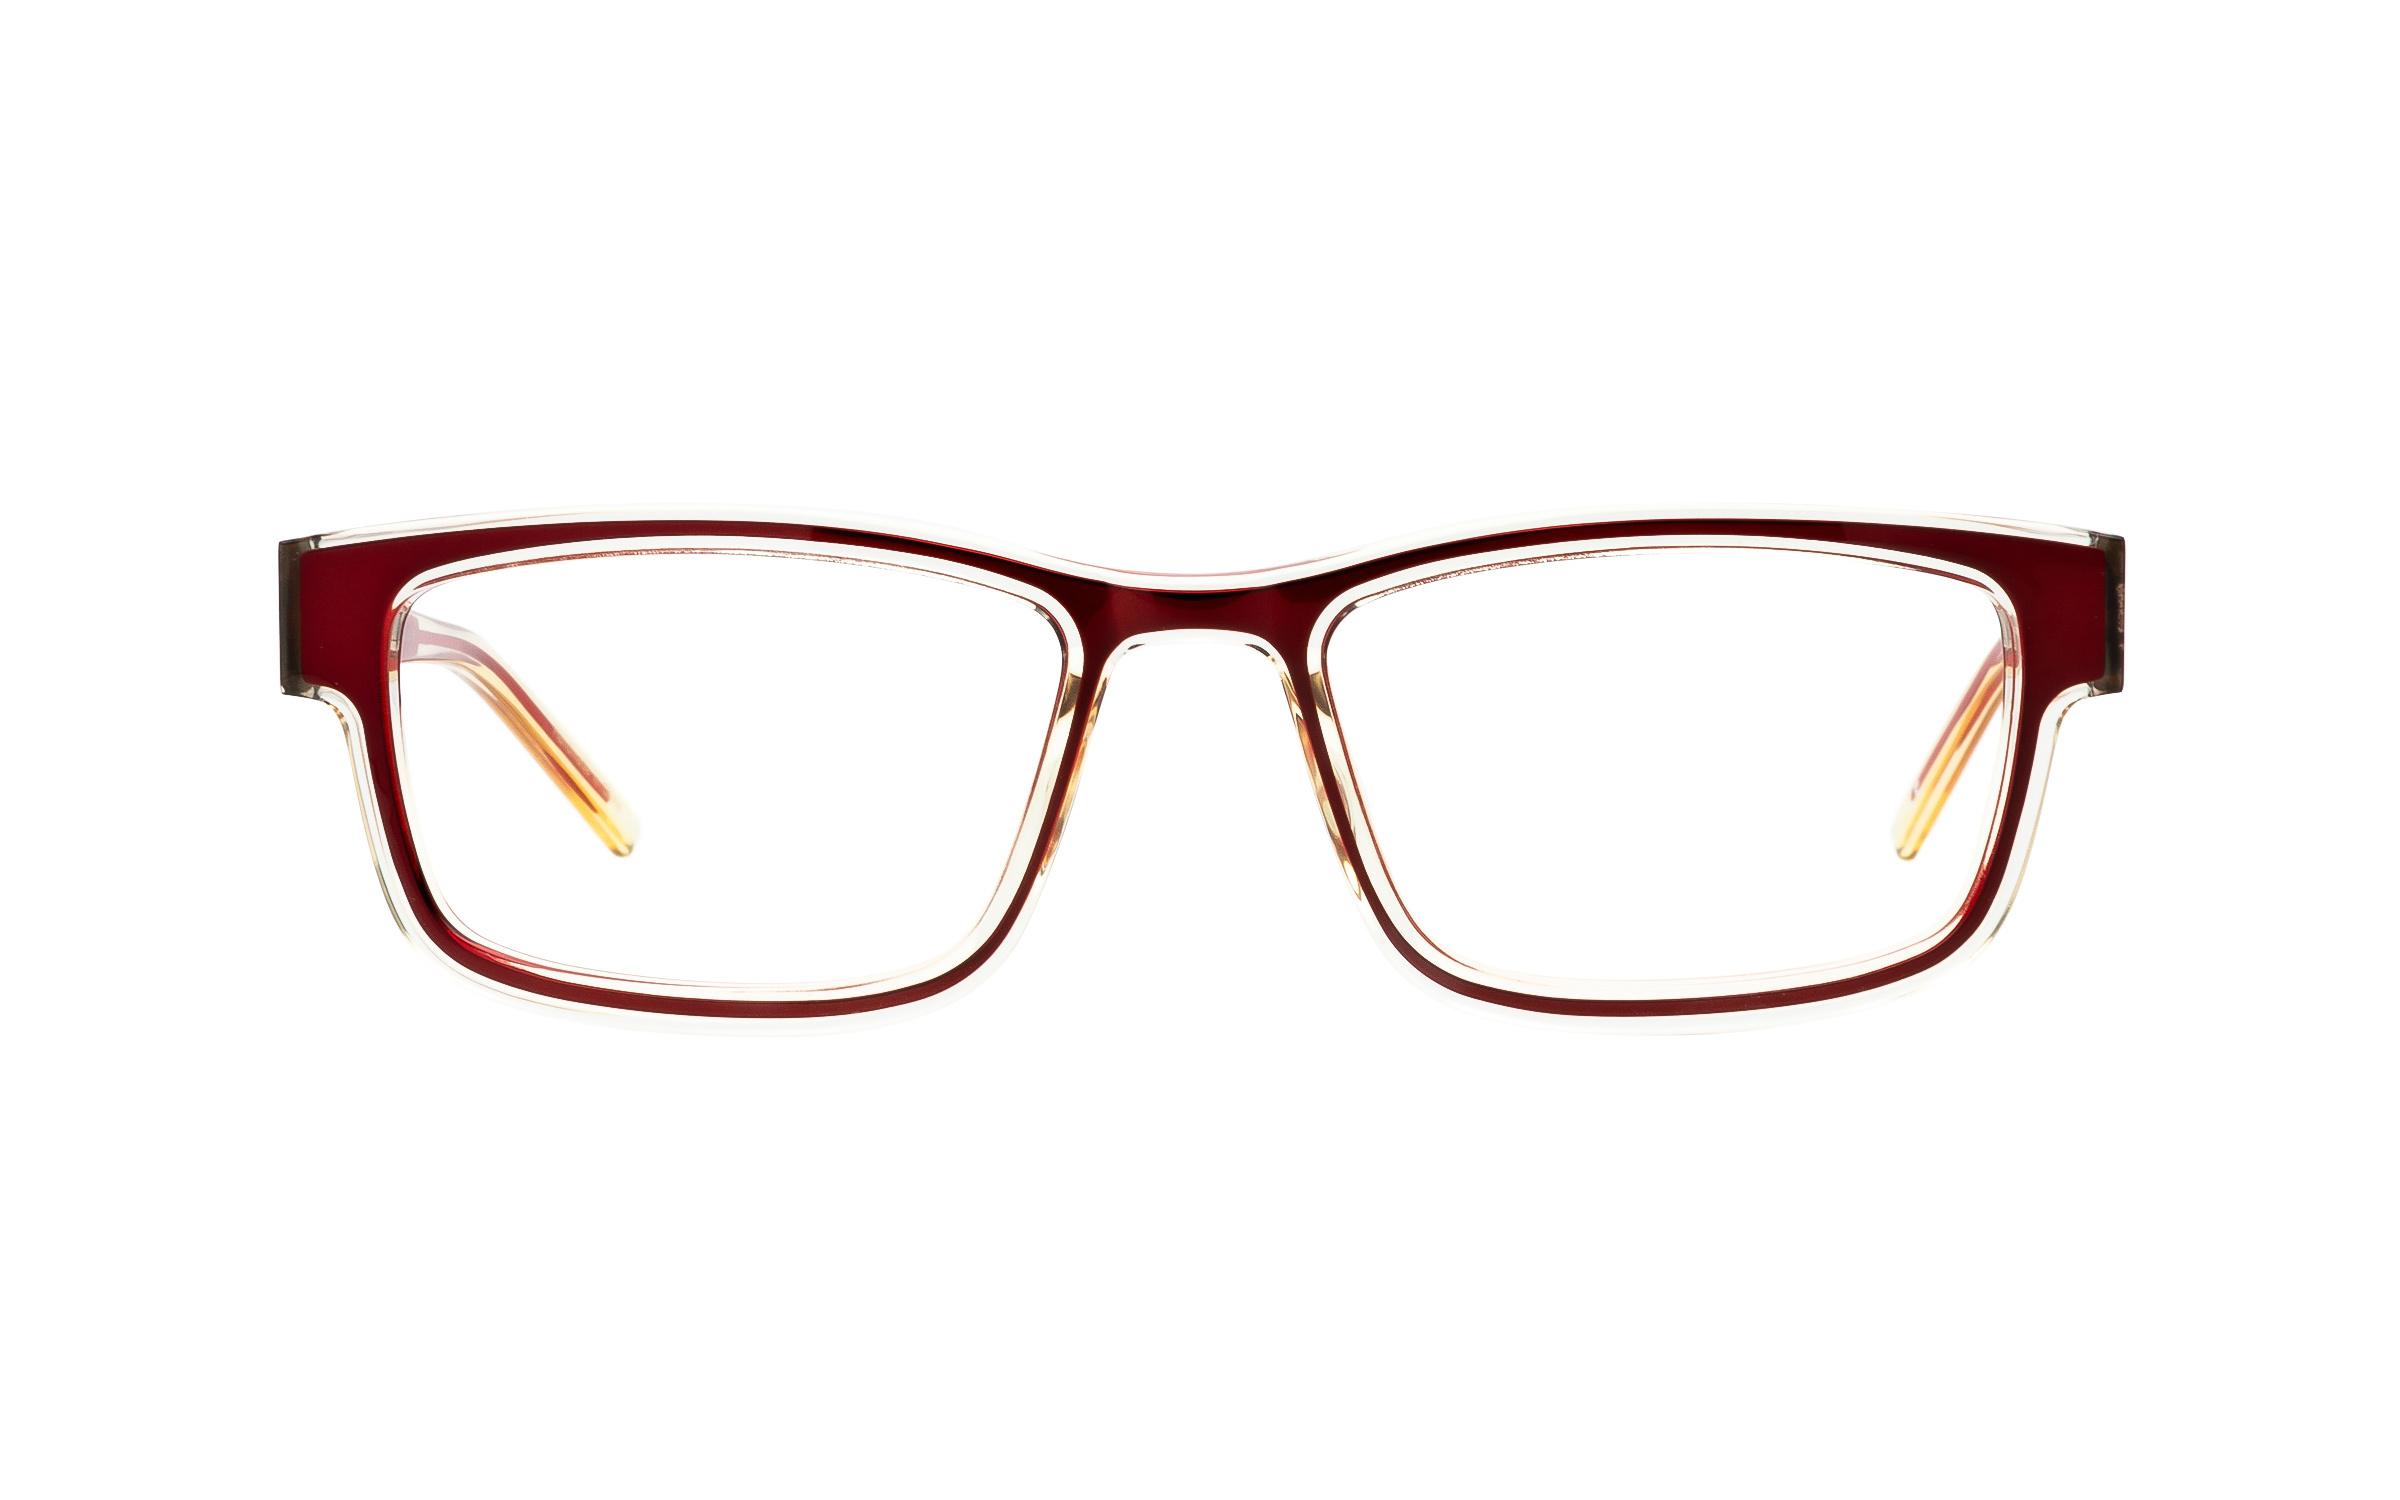 http://www.coastal.com/ - Jhane Barnes Converge BC (54) Eyeglasses and Frame in Brick Red | Acetate – Online Coastal